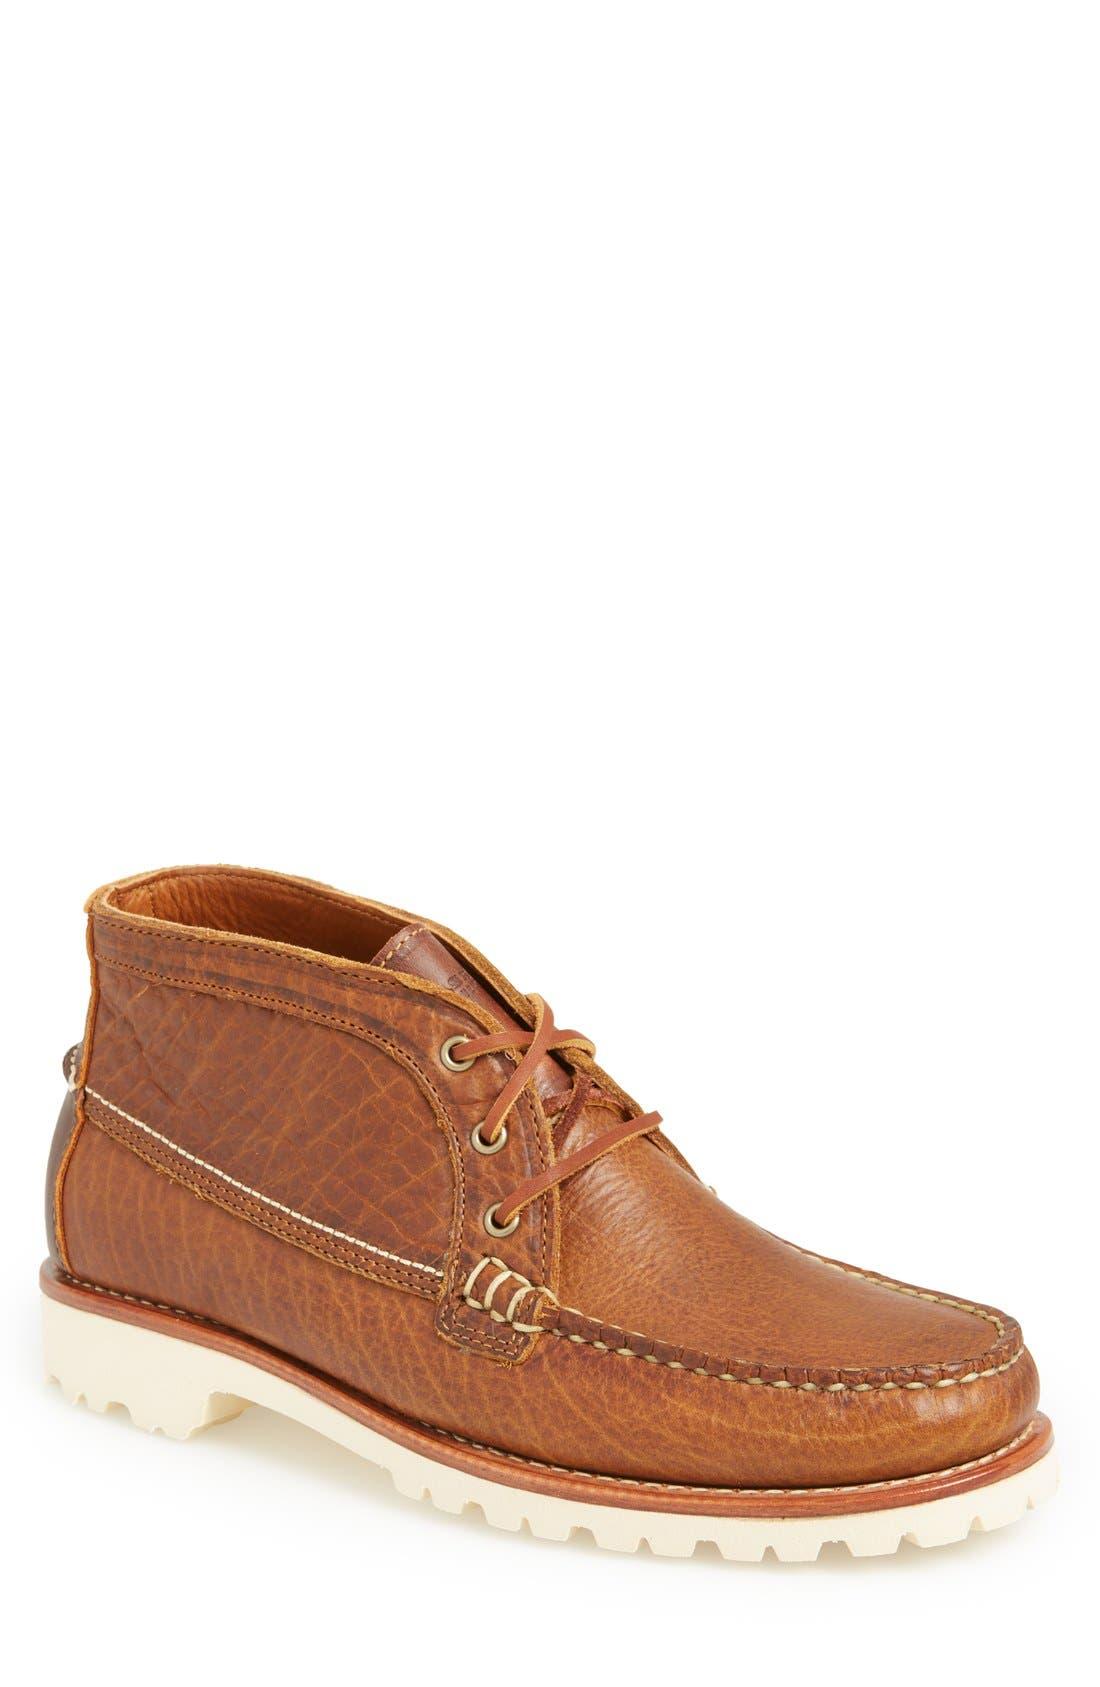 'Charlo' Moc Toe Boot,                         Main,                         color,